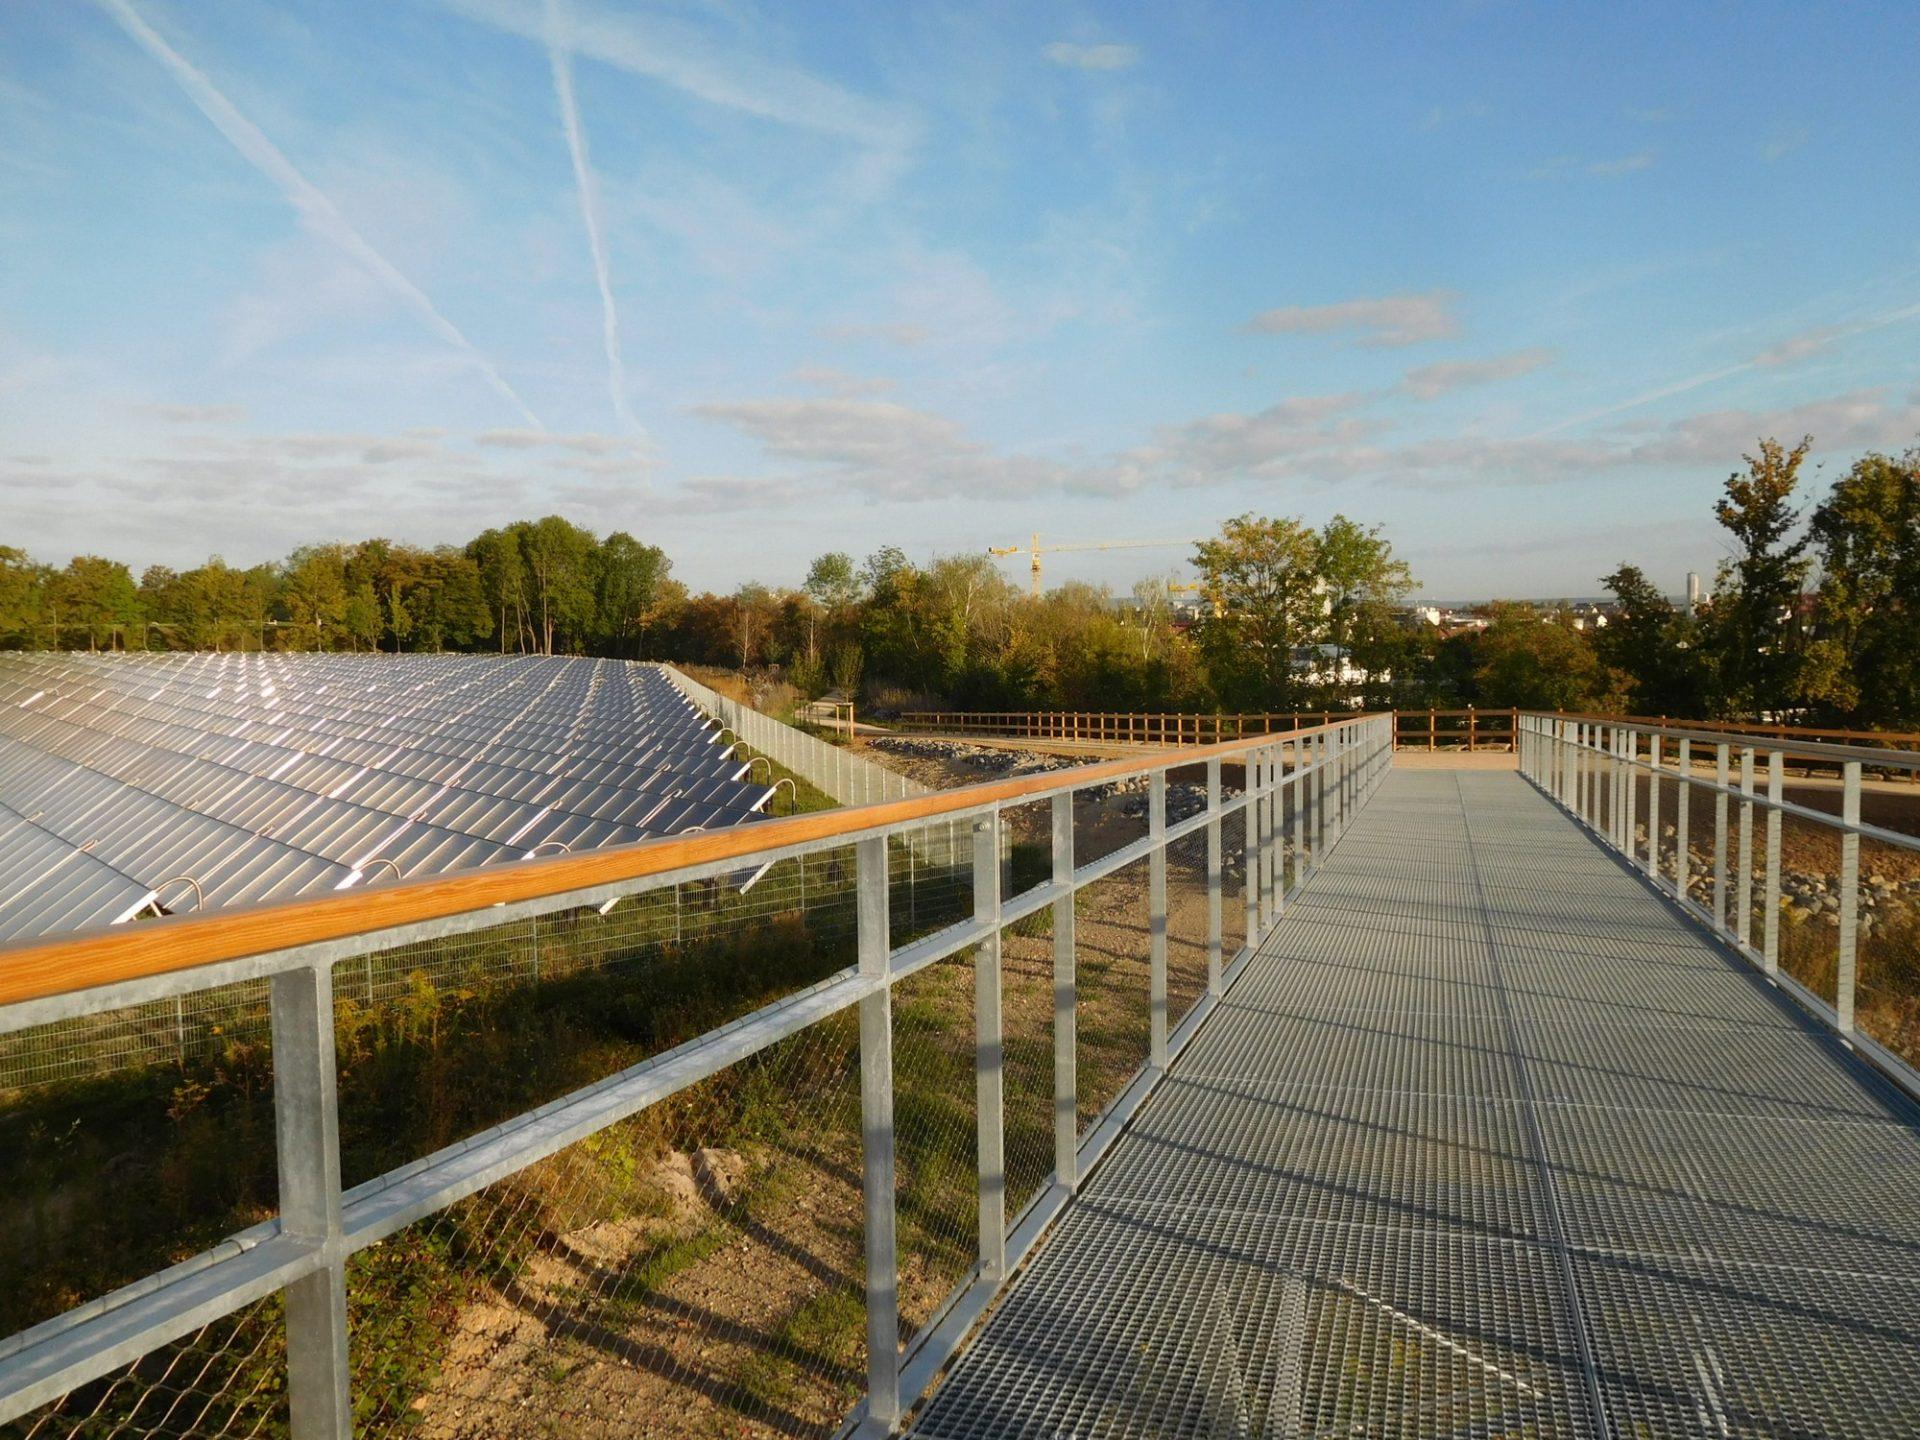 Ludwigsburg, Solarthermieanlage Römerhügel